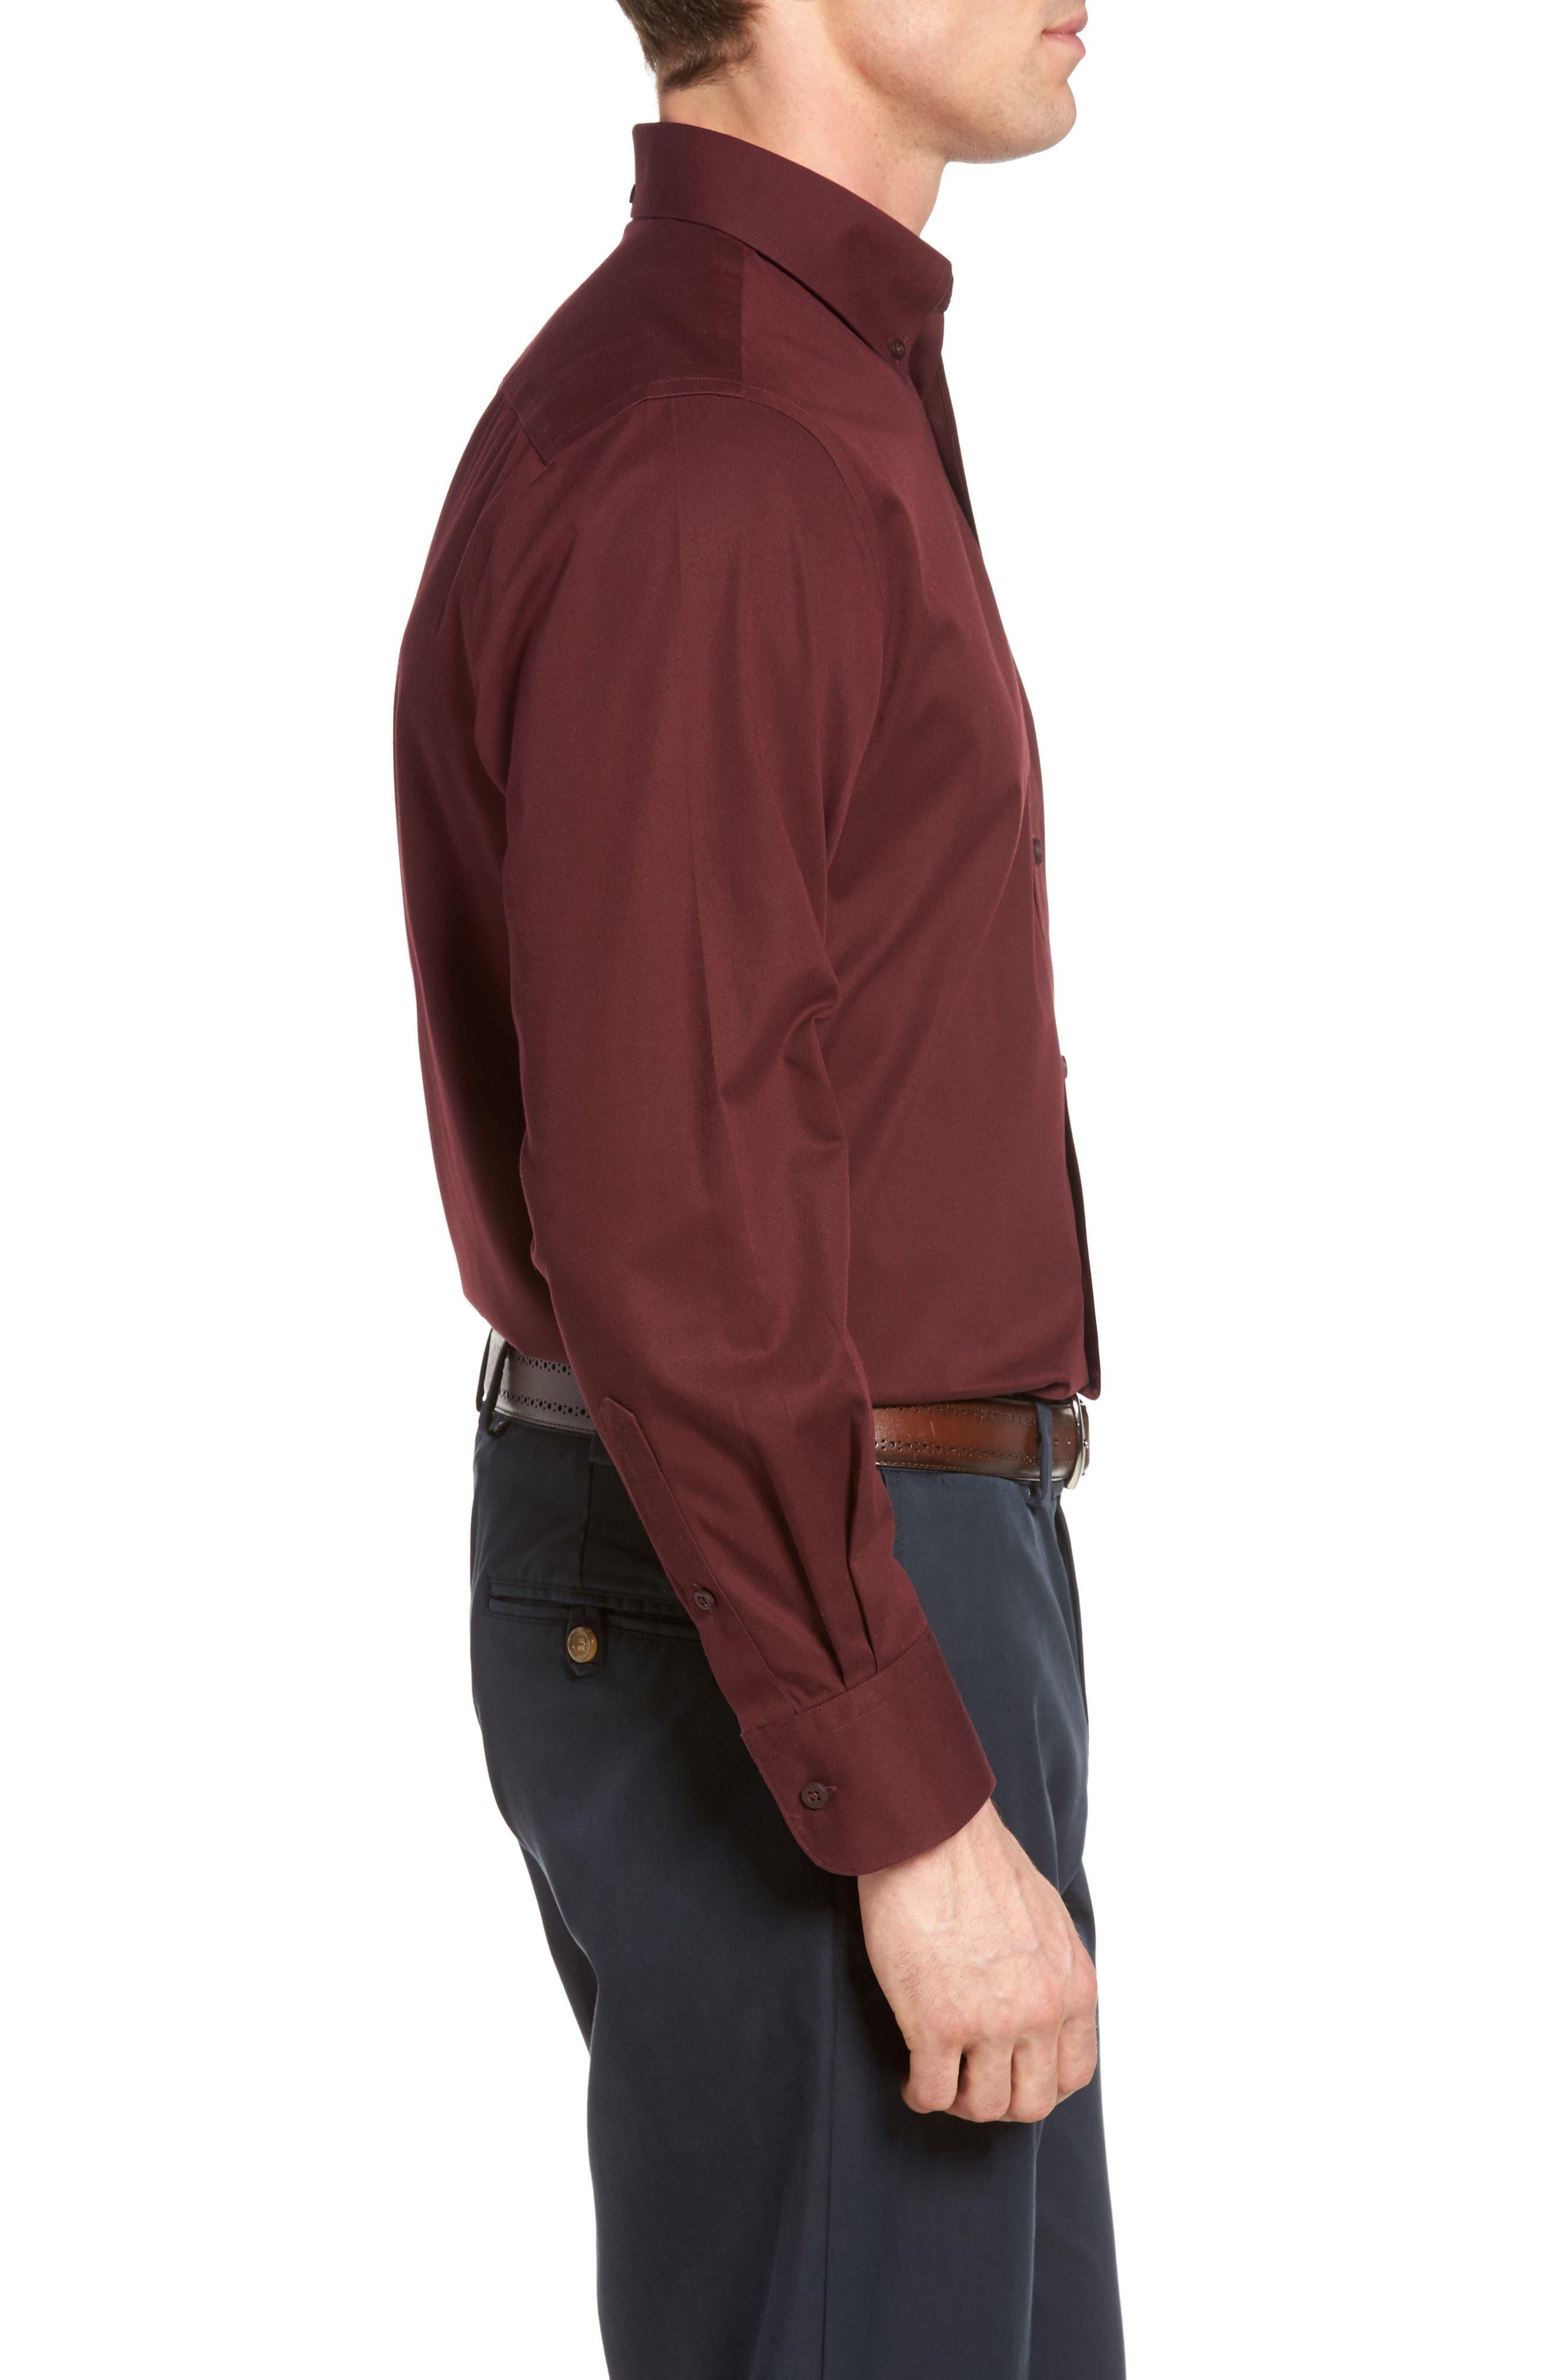 NORDSTROM MEN'S SHOP, Smartcare<sup>™</sup> Traditional Fit Twill Boat Shirt, Alternate thumbnail 3, color, BURGUNDY ROYALE